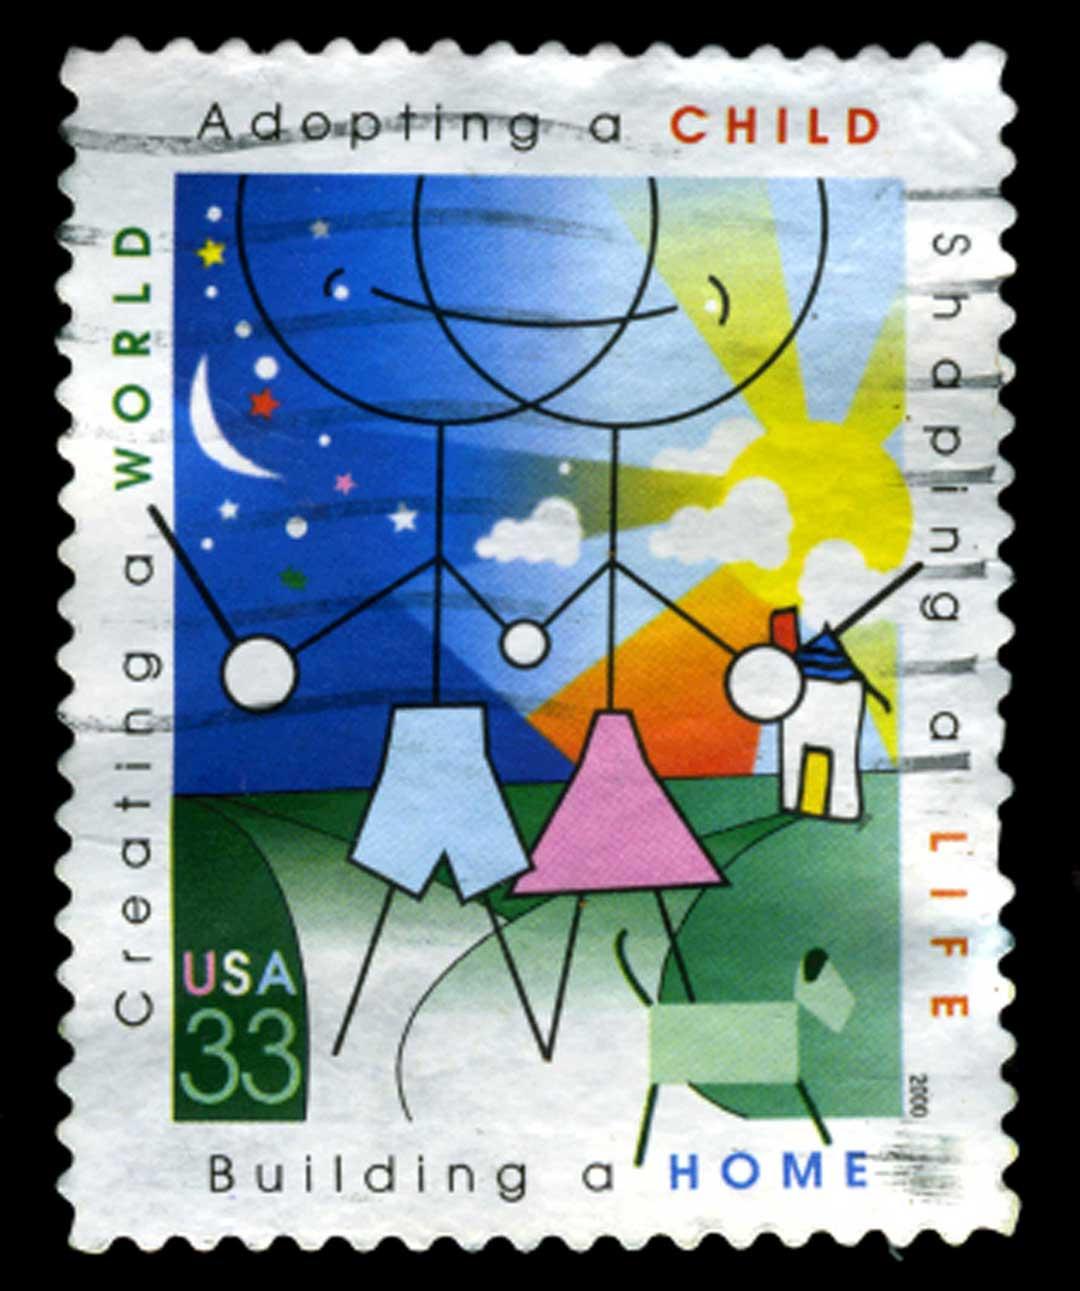 Orlando Adoption Attorney Orange County Florida Adoption Lawyer Seminole County Adoption Osceola County